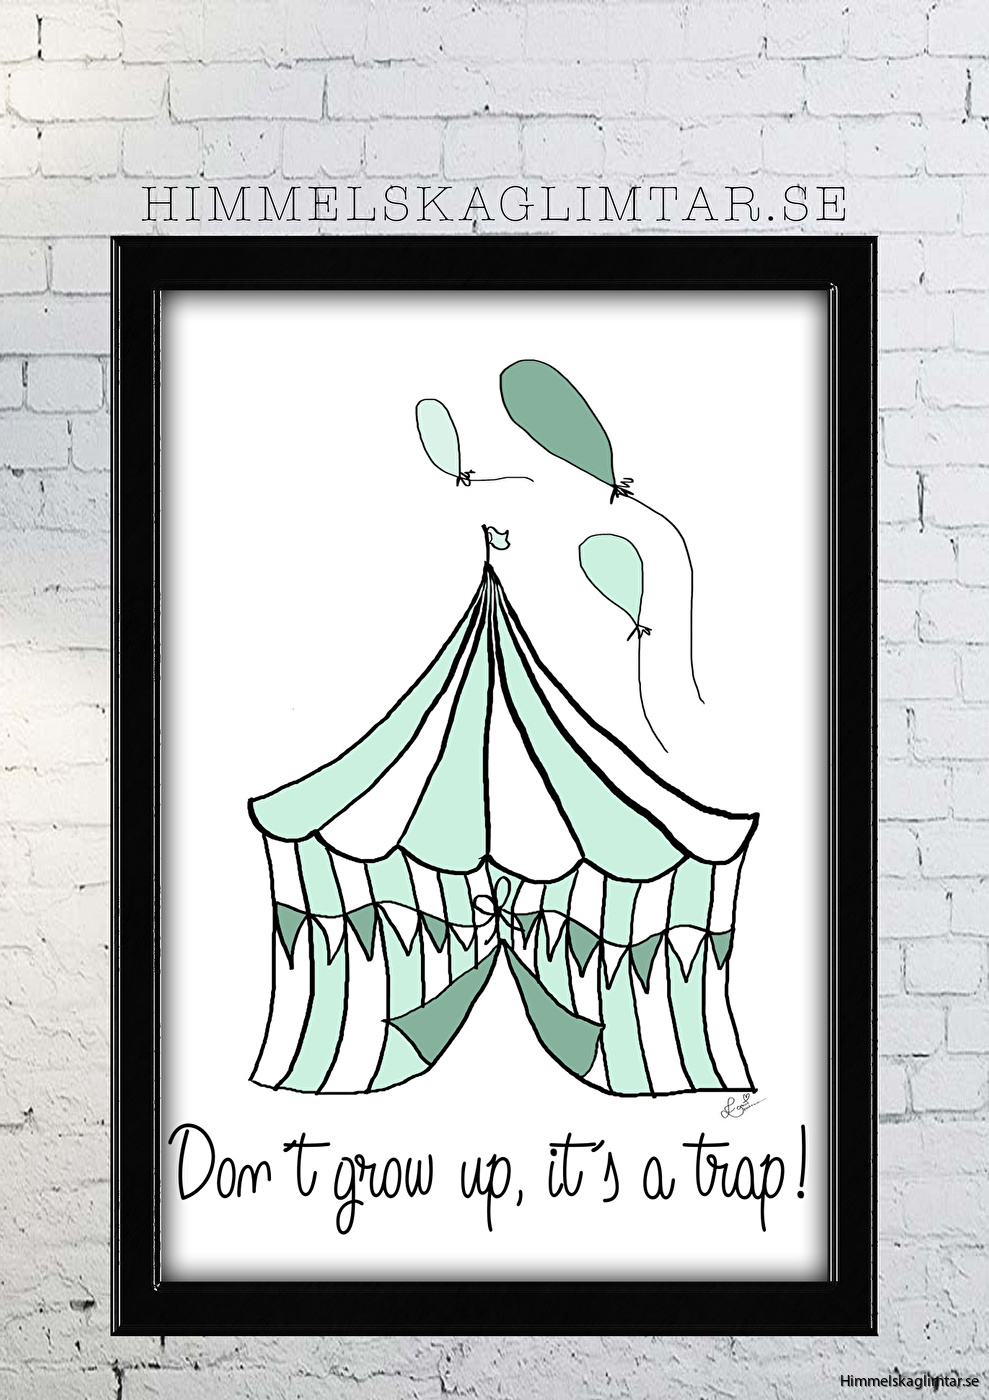 barnrum-barnrumsinredning-barnposter-poster-himmelskaglimtar-circus-dont grow up-pojkrum